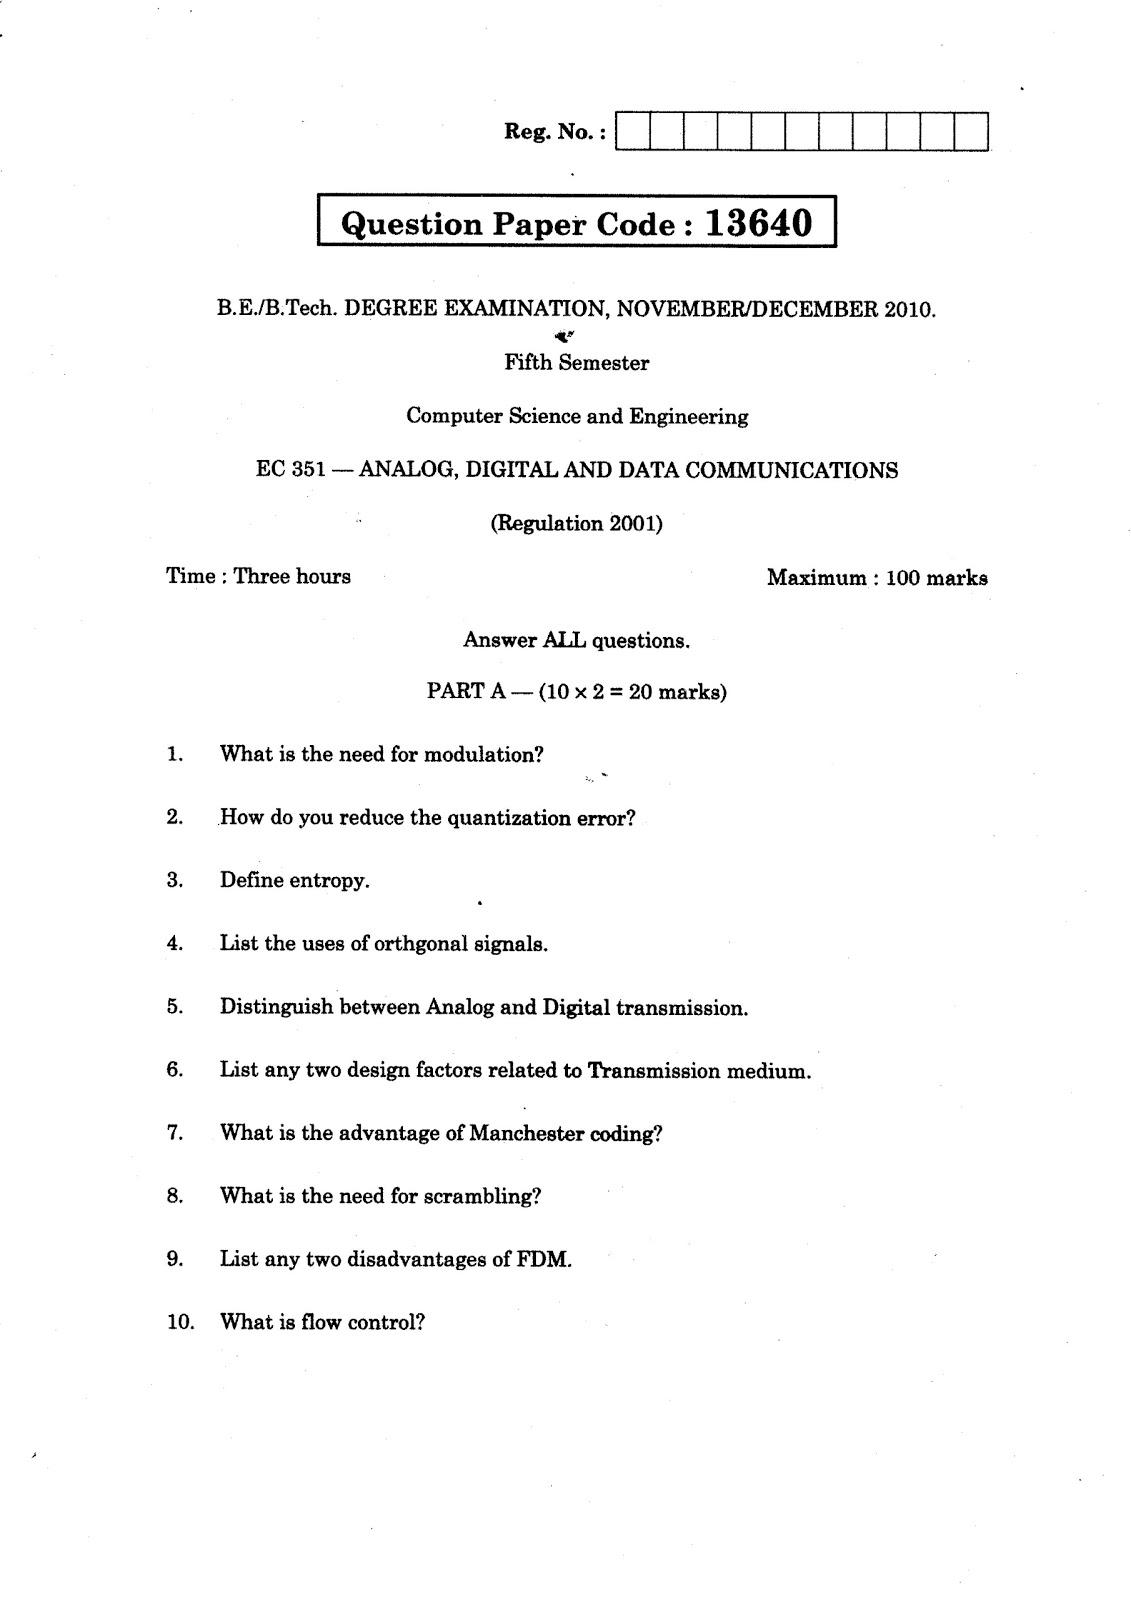 Anna University Question Bank Analog Digital And Data